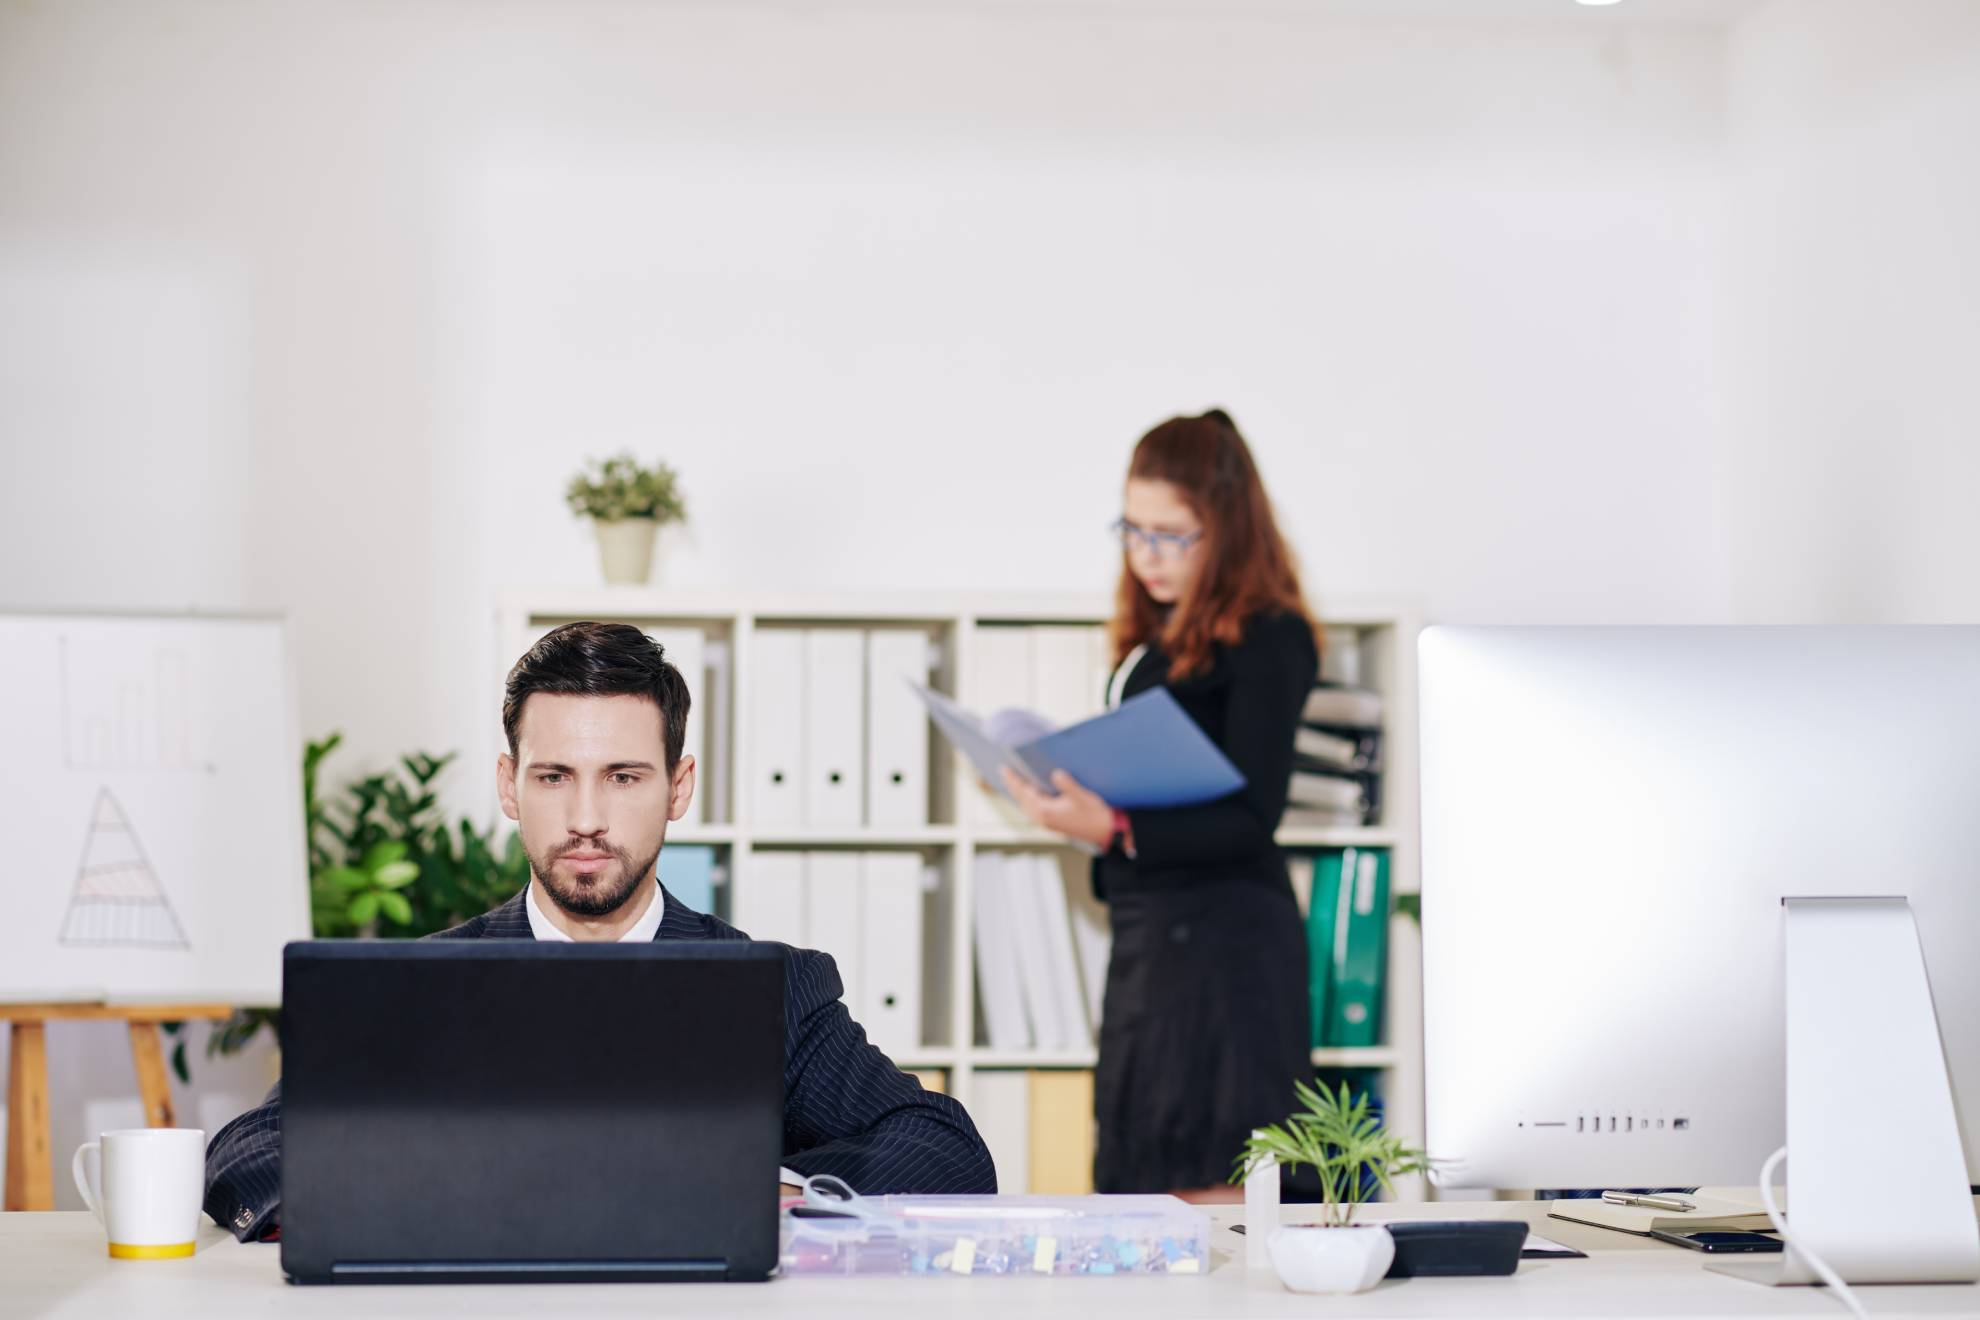 businessman-working-on-laptop-NJPTBFQ (1)